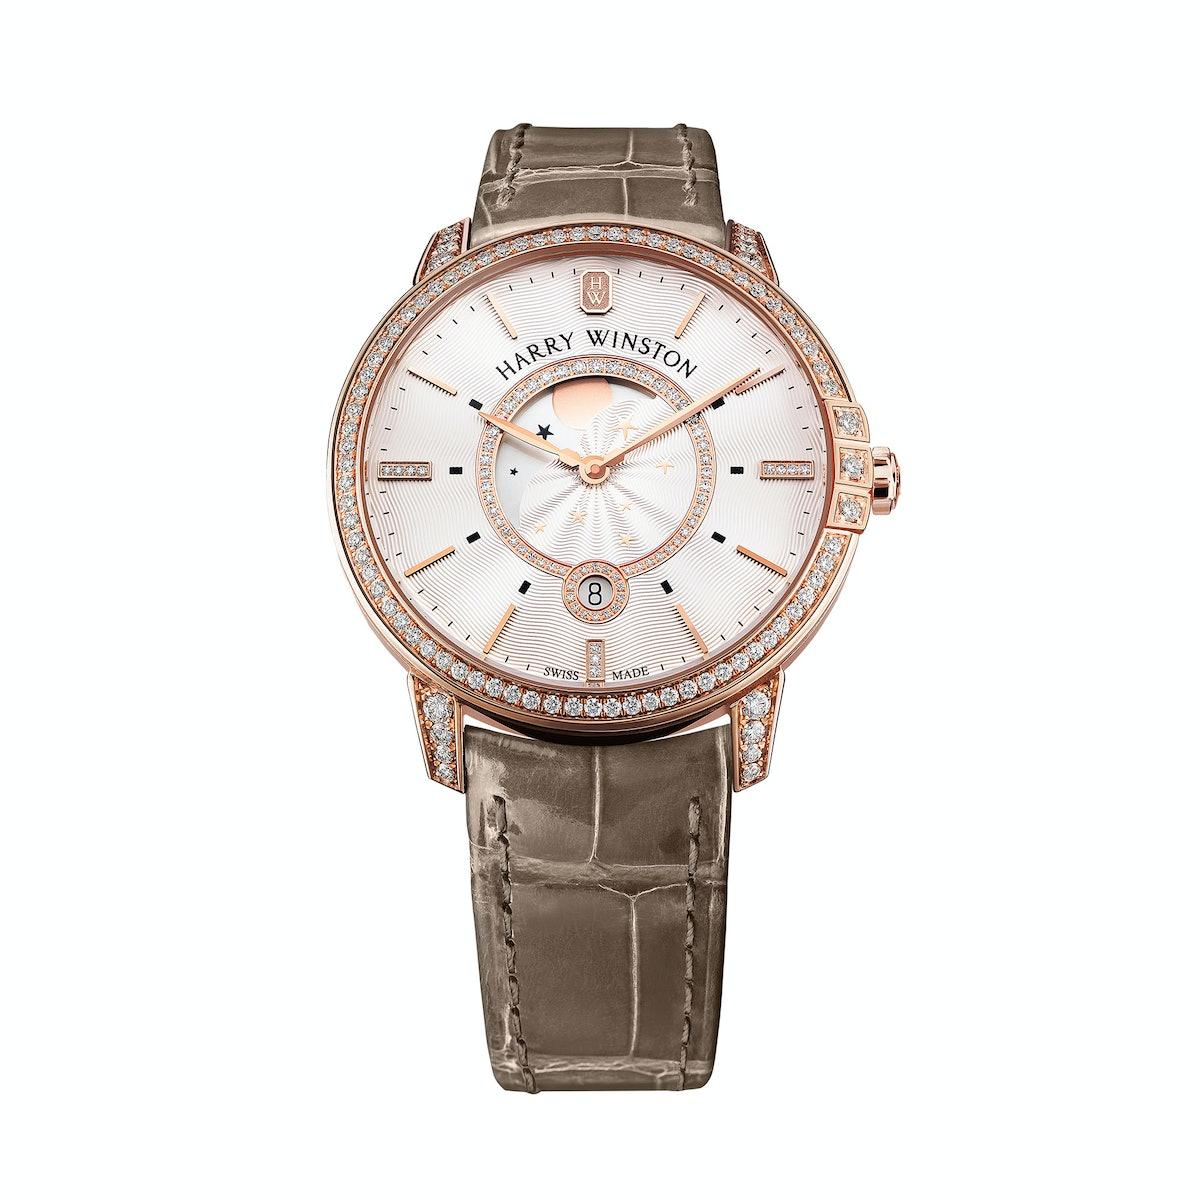 Harry Winston gold and diamond watch